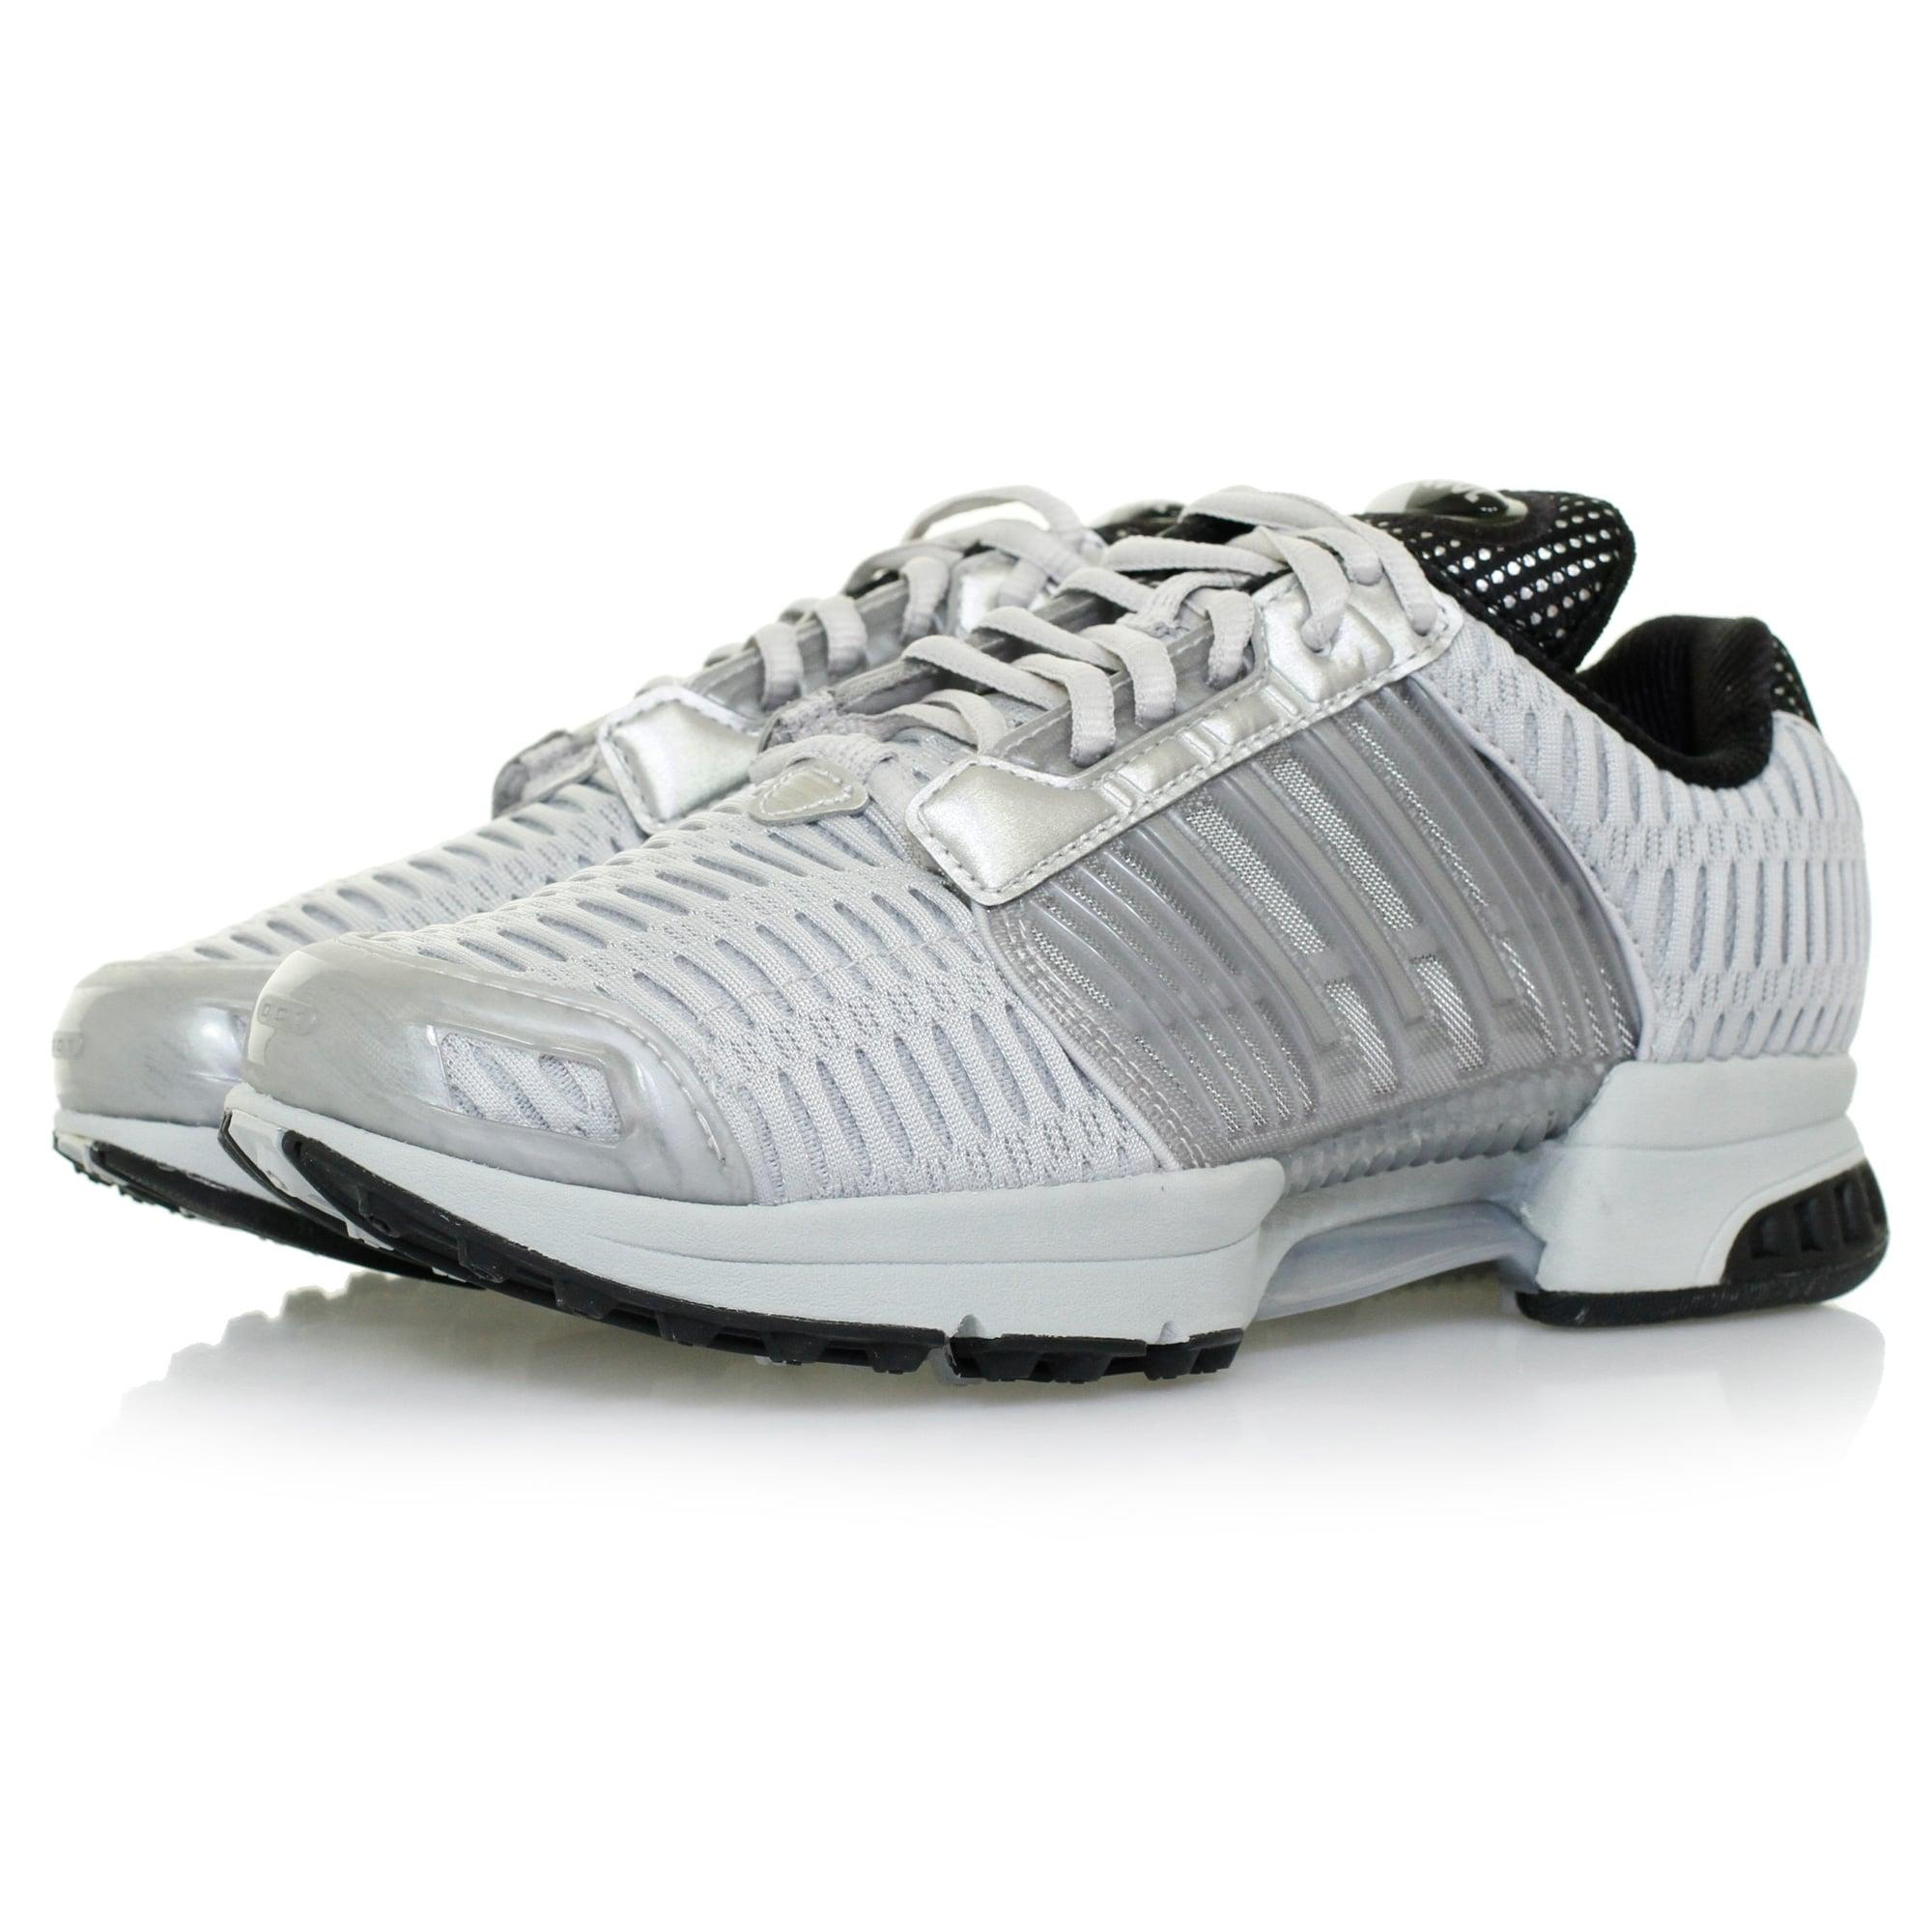 purchase cheap 2d440 daa76 Lyst - Adidas Originals Clima Cool 1 Silver Shoe in Metallic